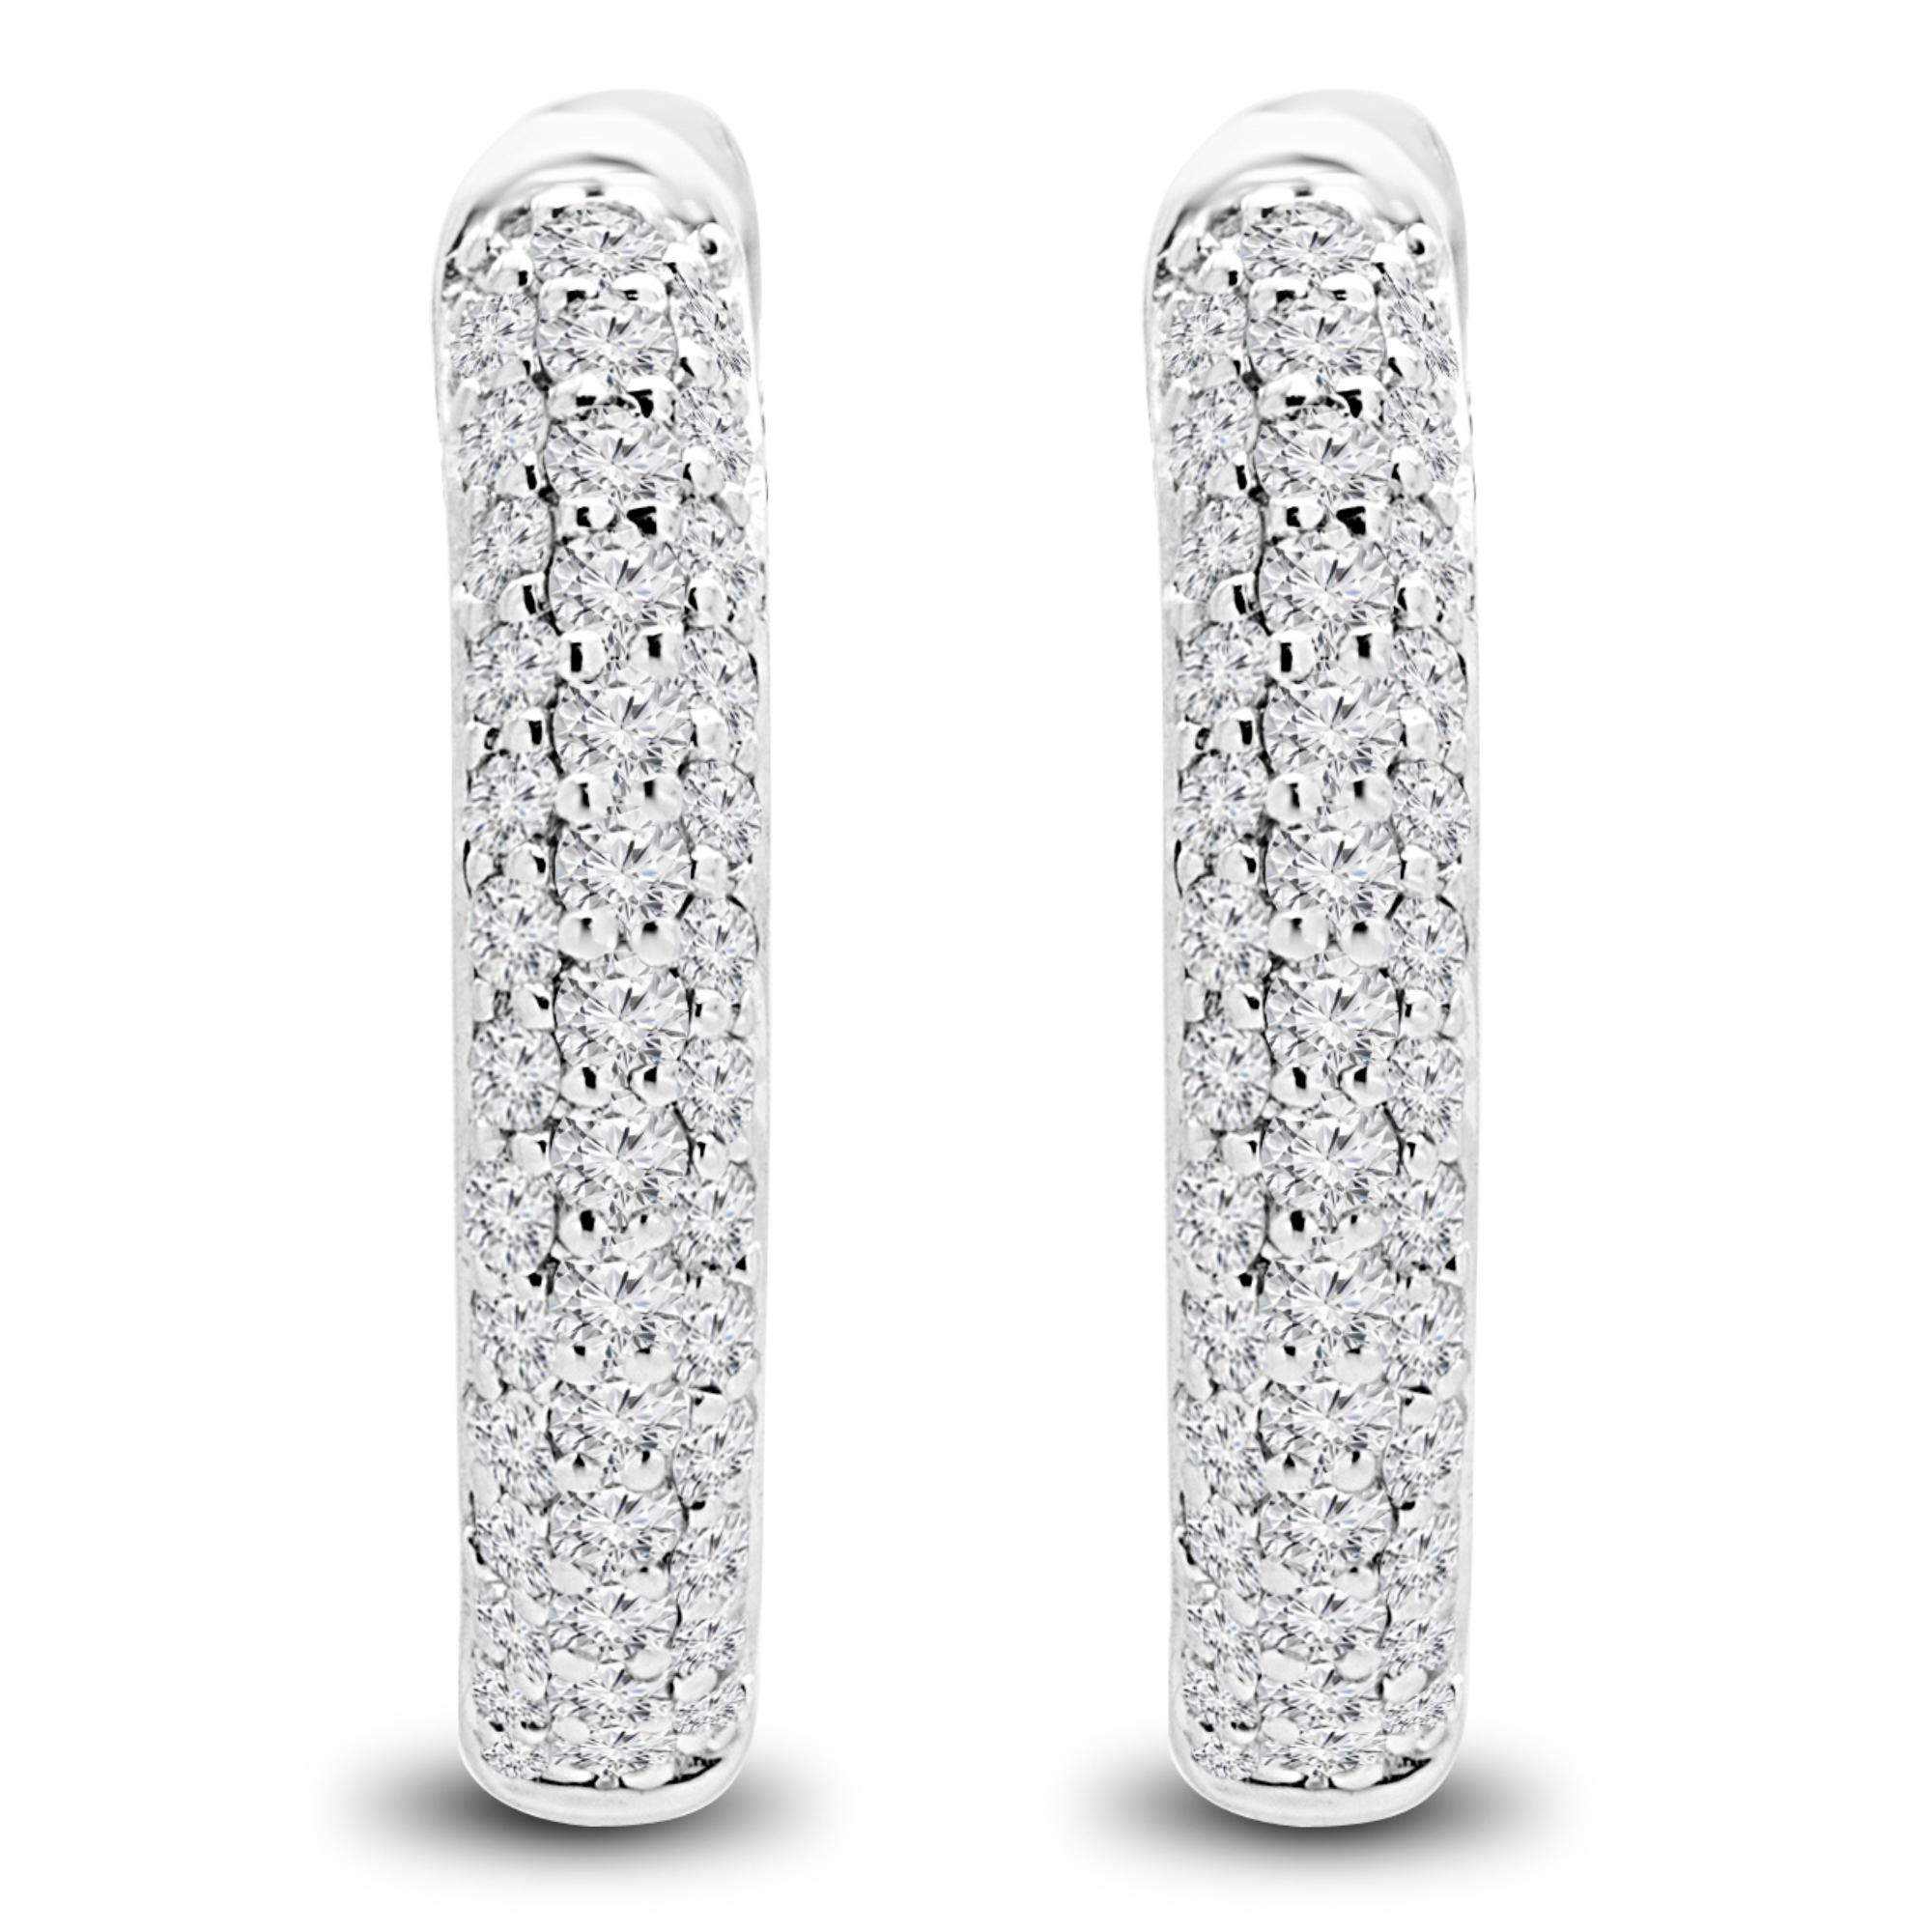 1/2 CTW Round Diamond Hoop Earrings in 14K White Gold (MDR170116) - image 1 de 2